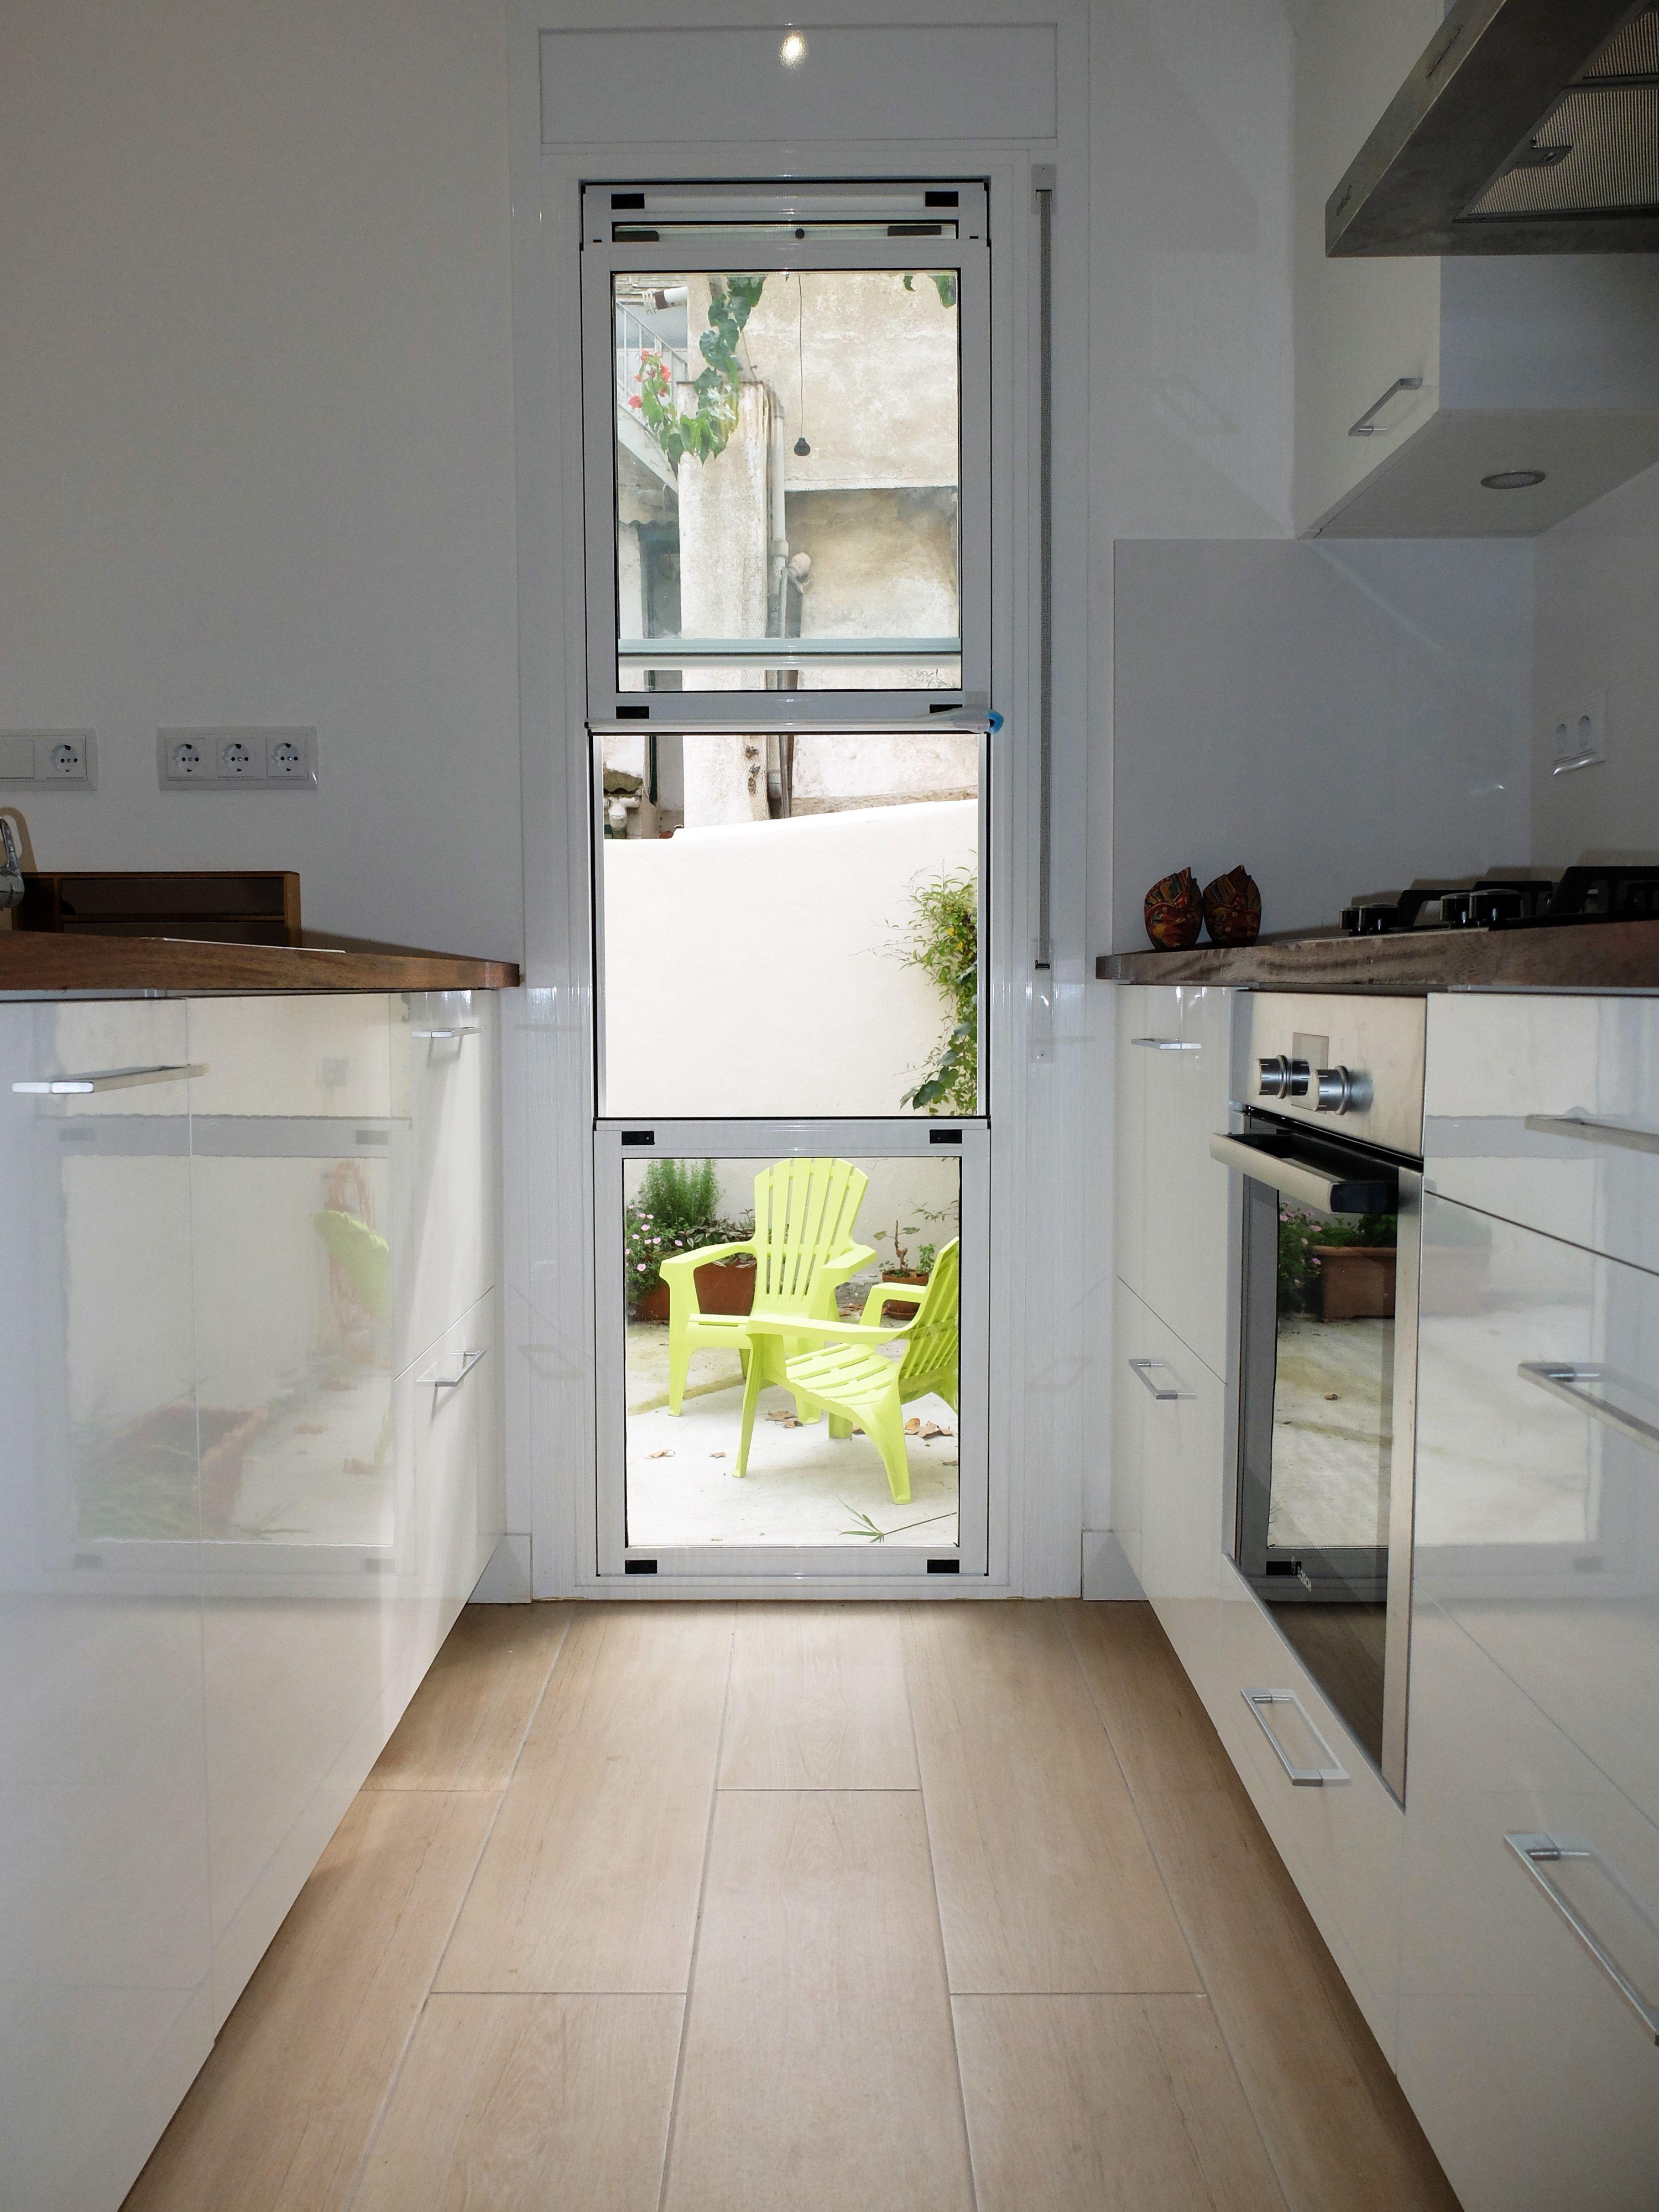 Reforma de cocina con pen nsula por accesible reformas - Accesible reformas ...